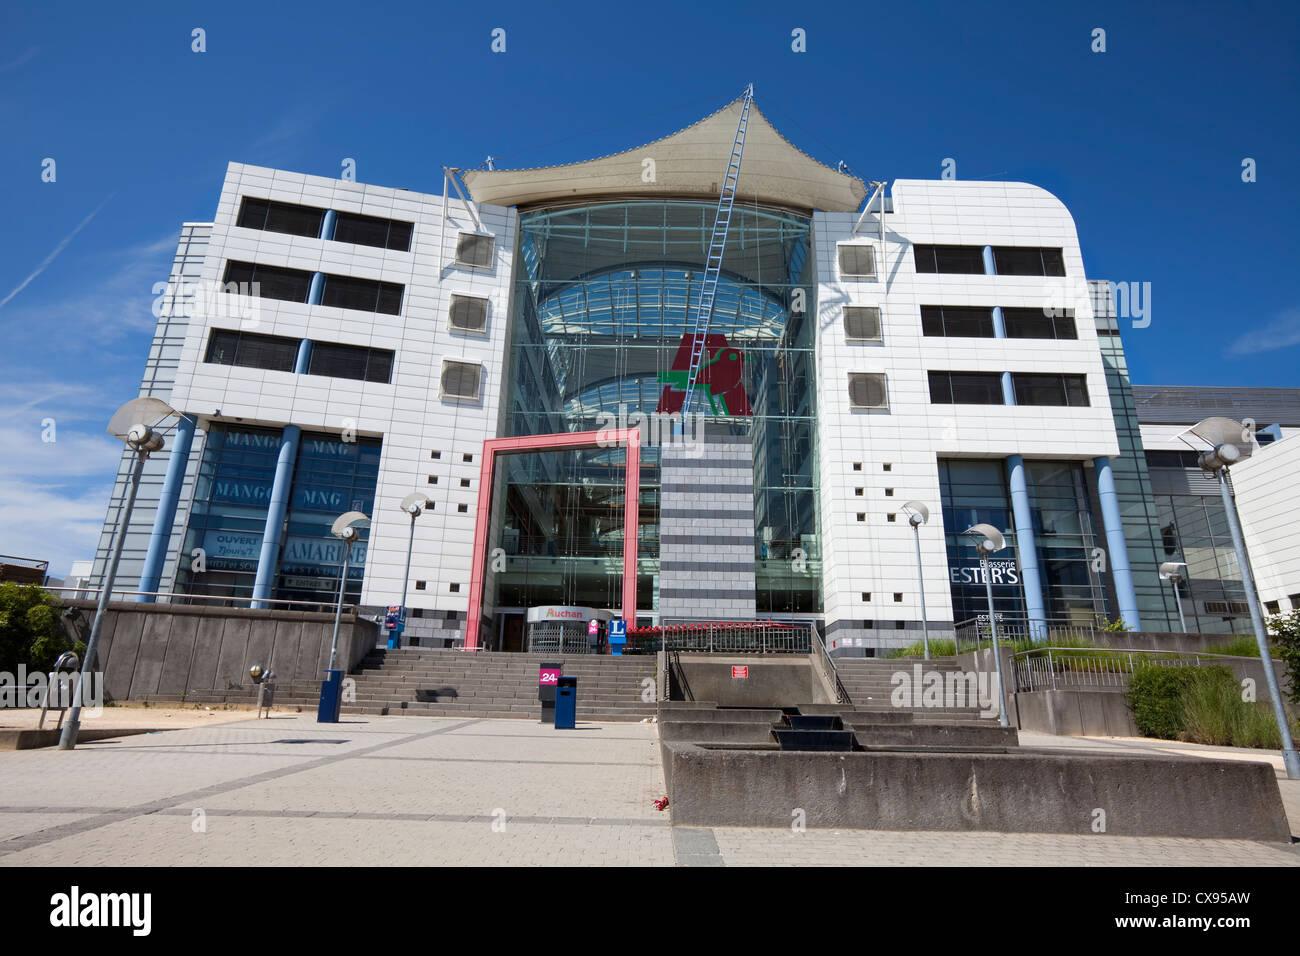 the Centre Auchan, Shopping Centre, Plateau de Kirchberg, Luxemburg, Europe - Stock Image